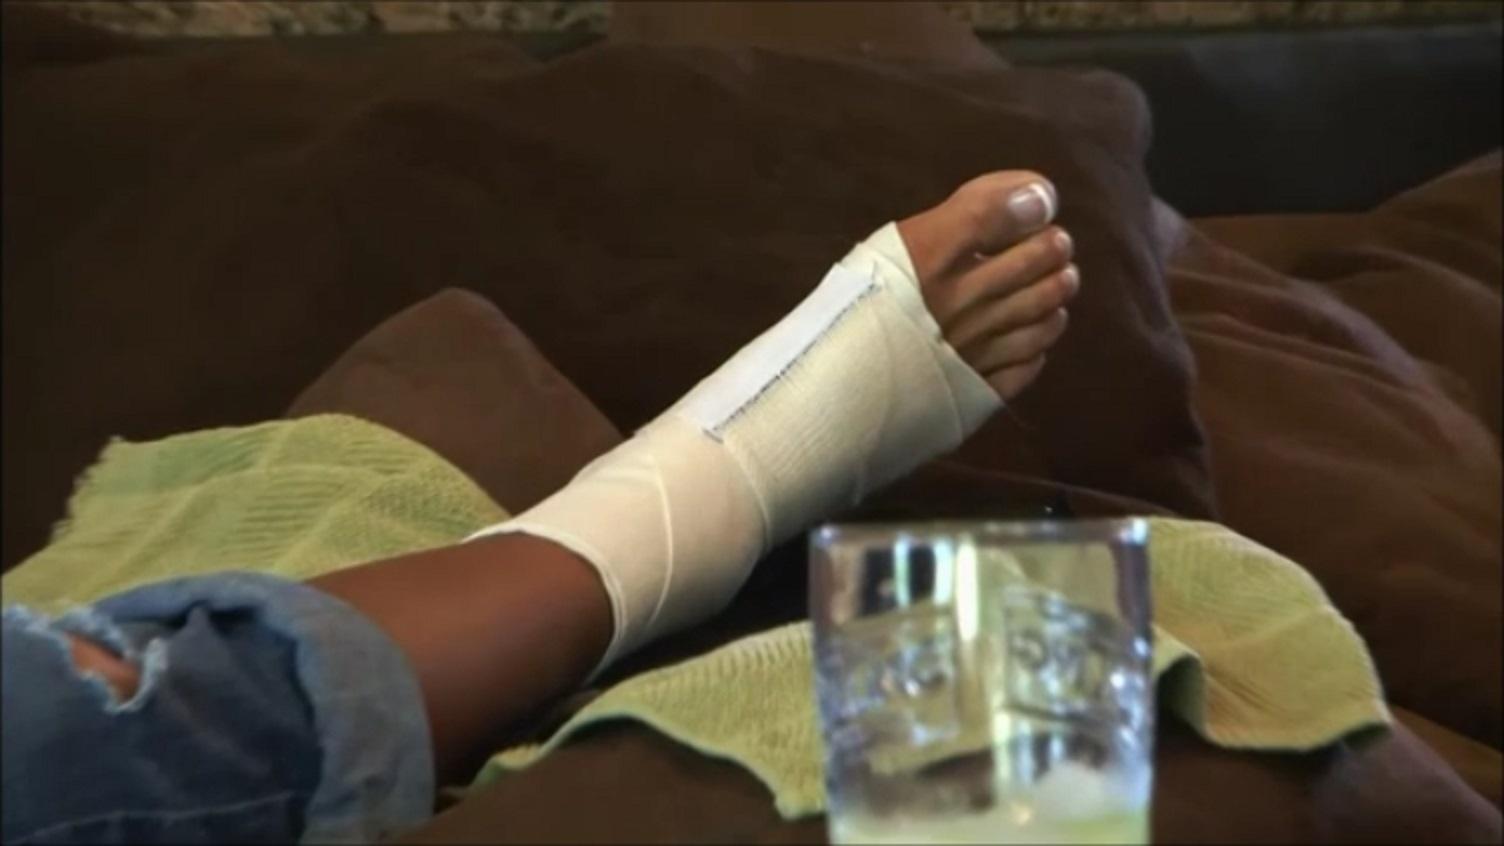 Katelyn Cuz Sims Feet (15 photos) - celebrity-feet.com